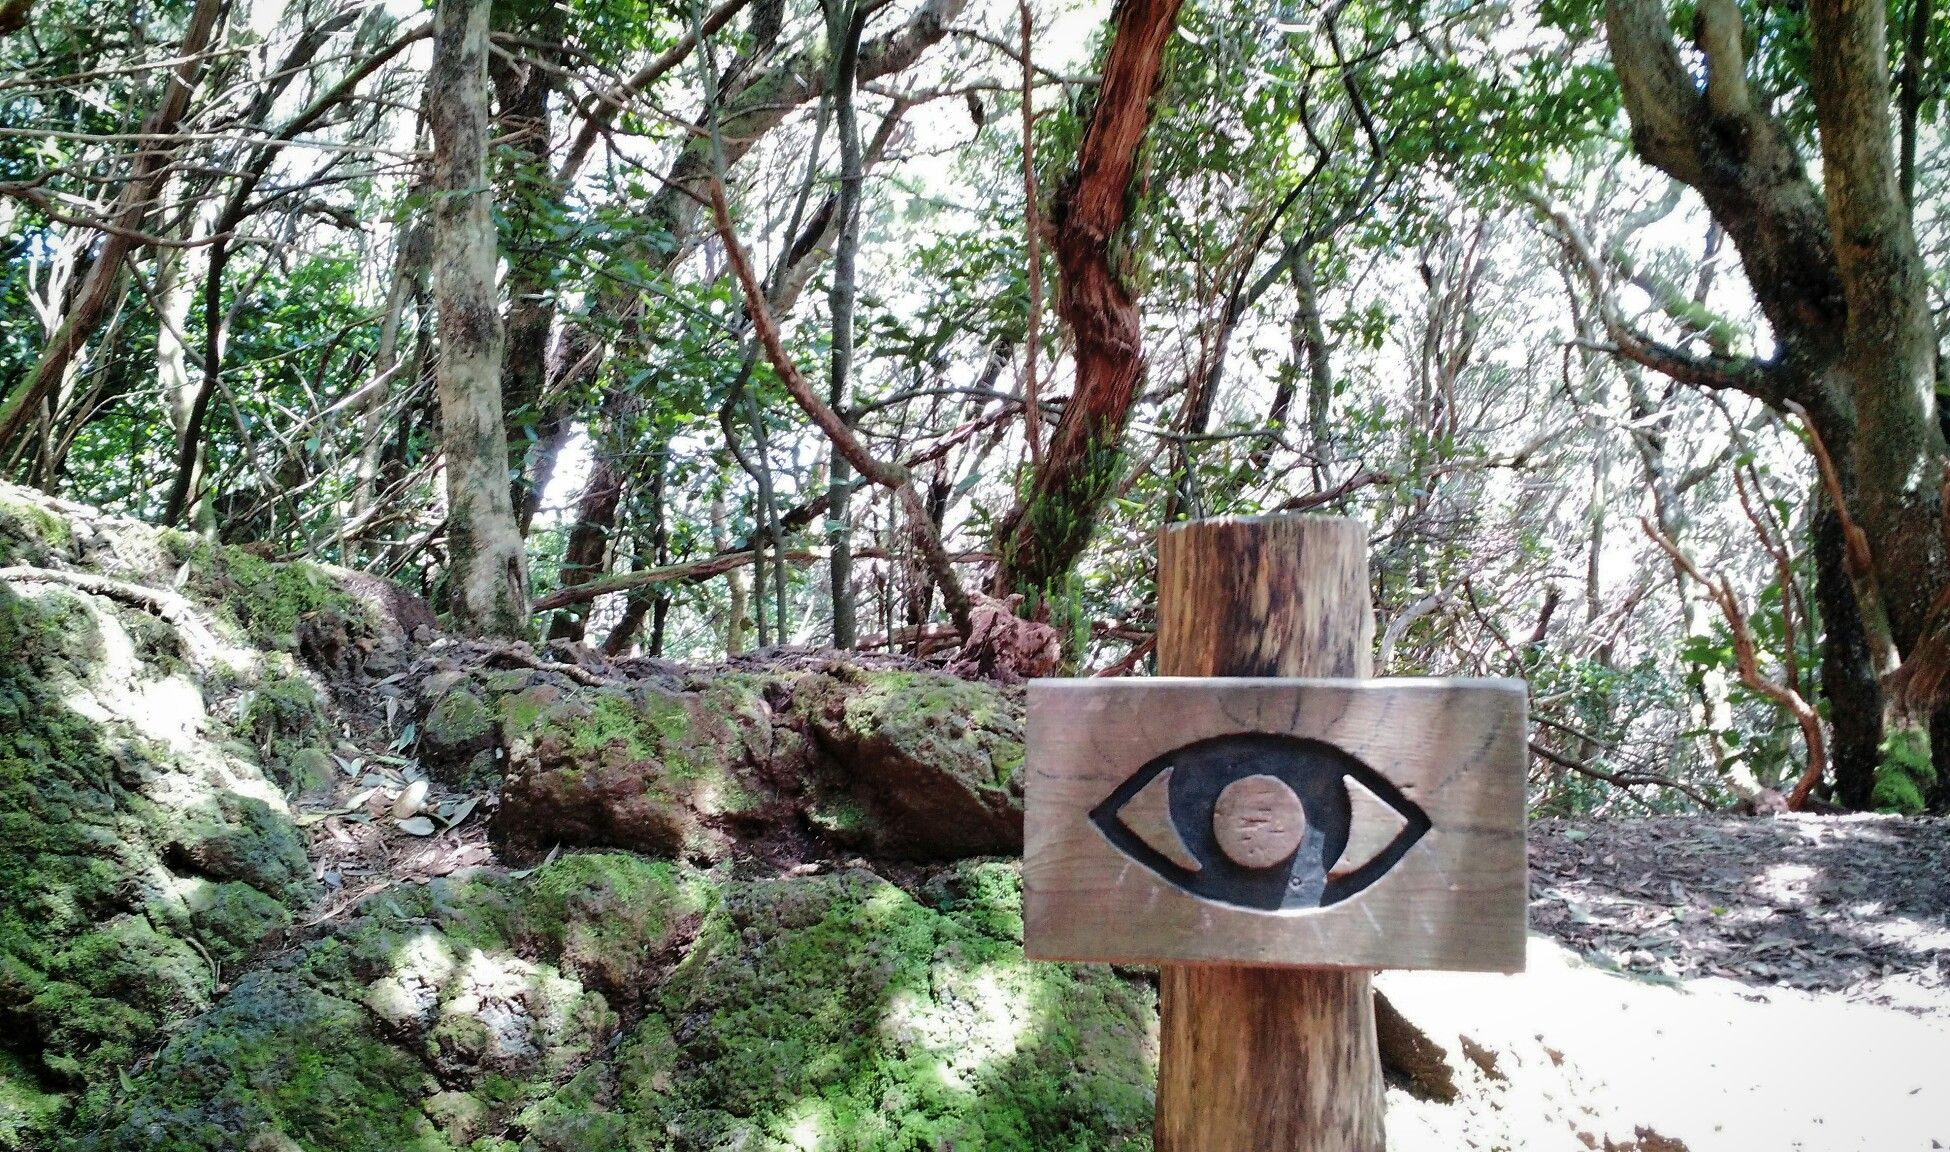 Sendero de los Sentidos, Anaga, Tenerife  #canarias #tenerife #wood #laurisilva #senderismo